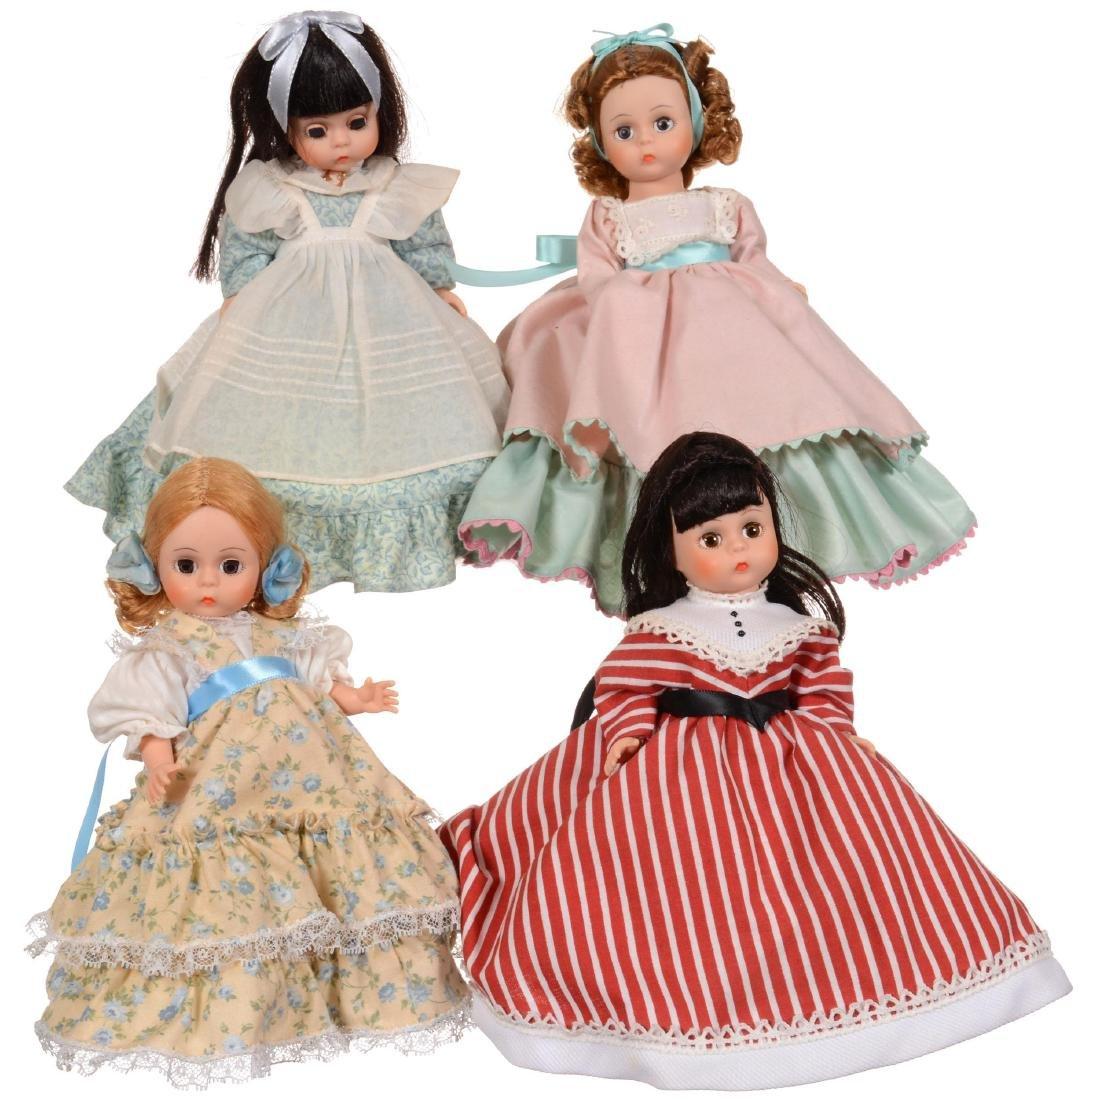 Ten Madame Alexander Dolls in Original Boxes - 5